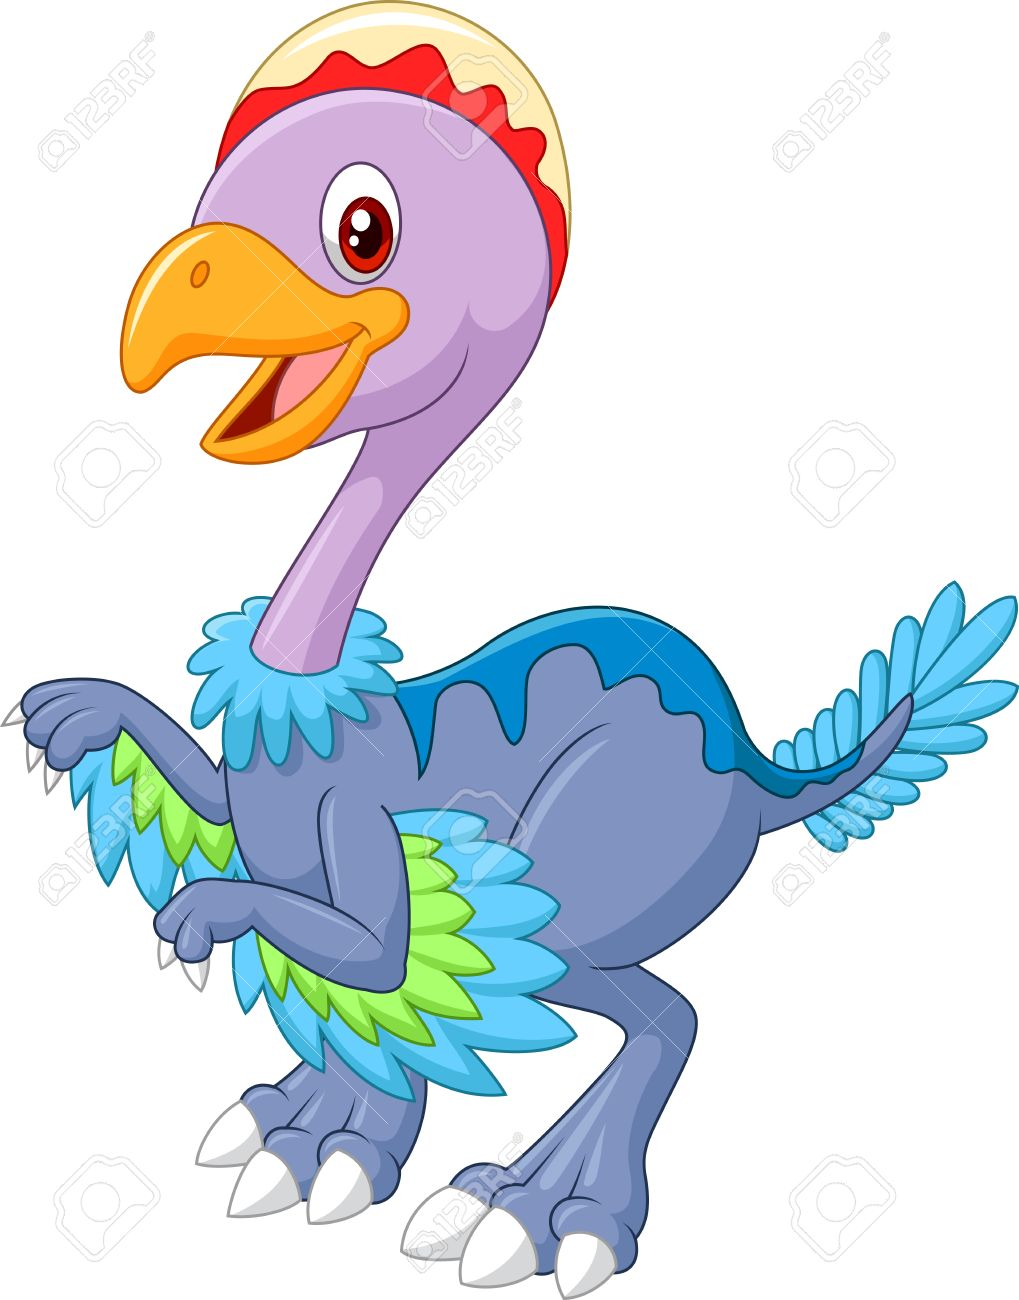 Cartoon happy dinosaur archaeopteryx, isolated on white background - 45169056